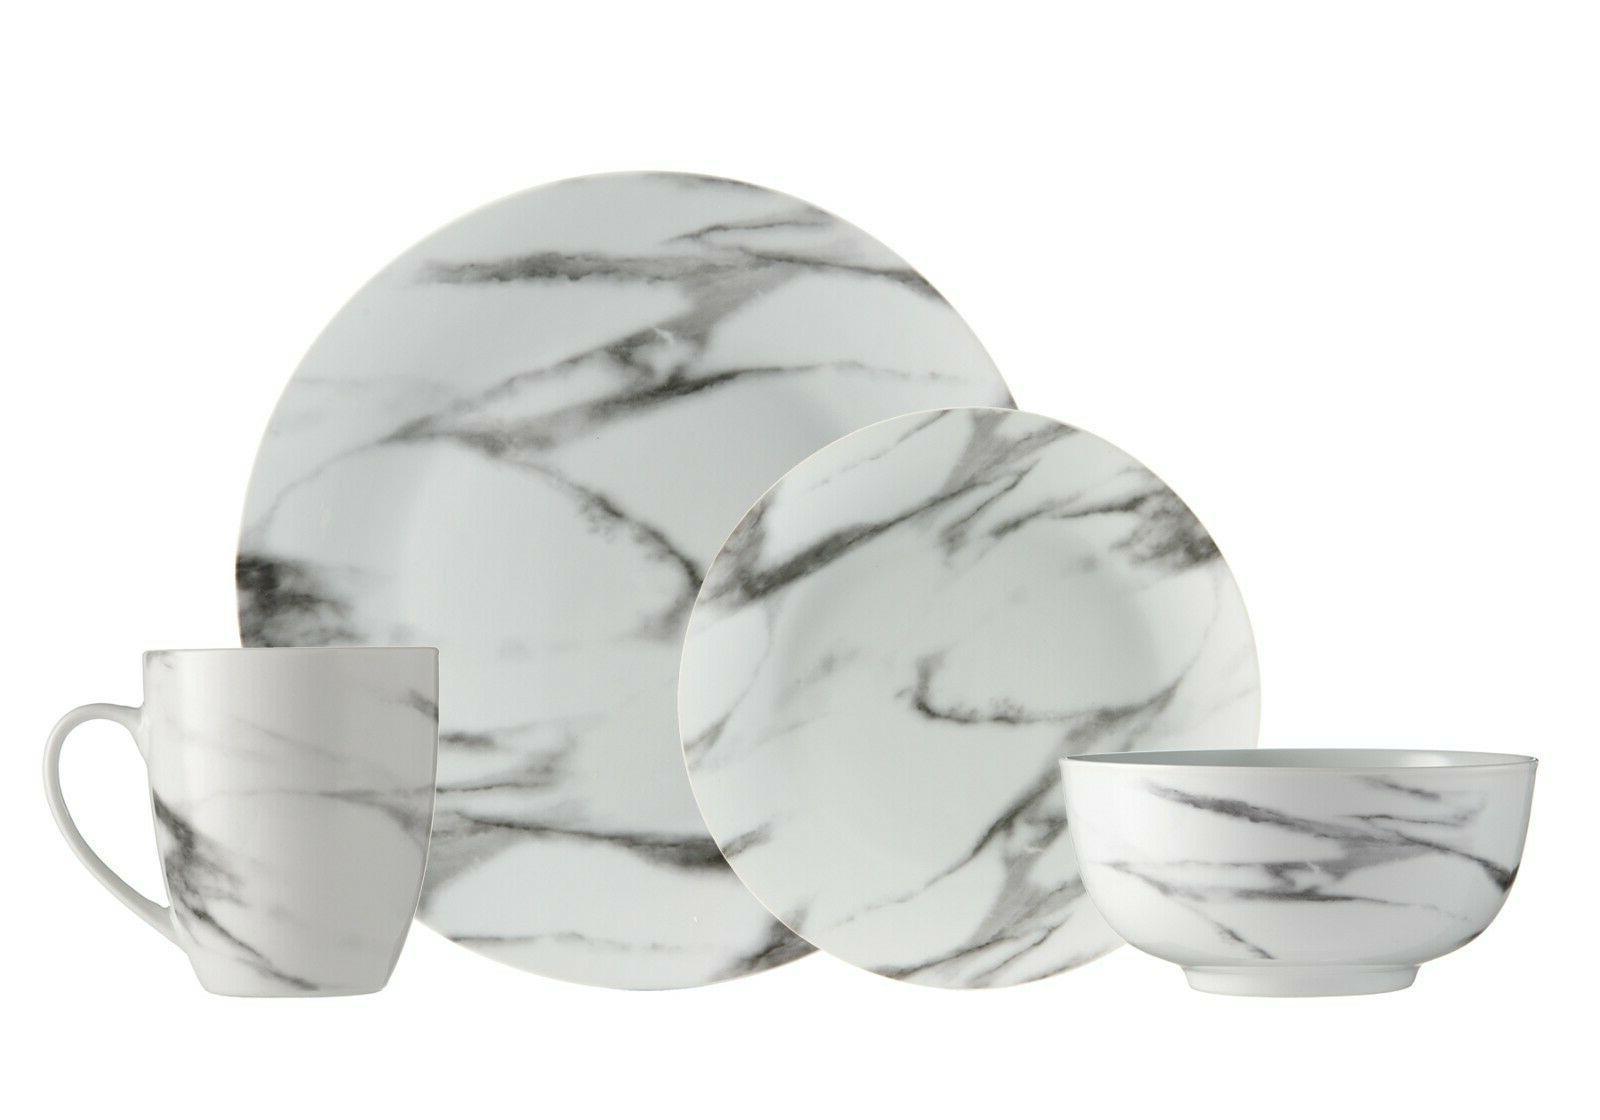 Dinnerware Set Marble 16-Piece for 4-Dish Set-Dinner Set Por